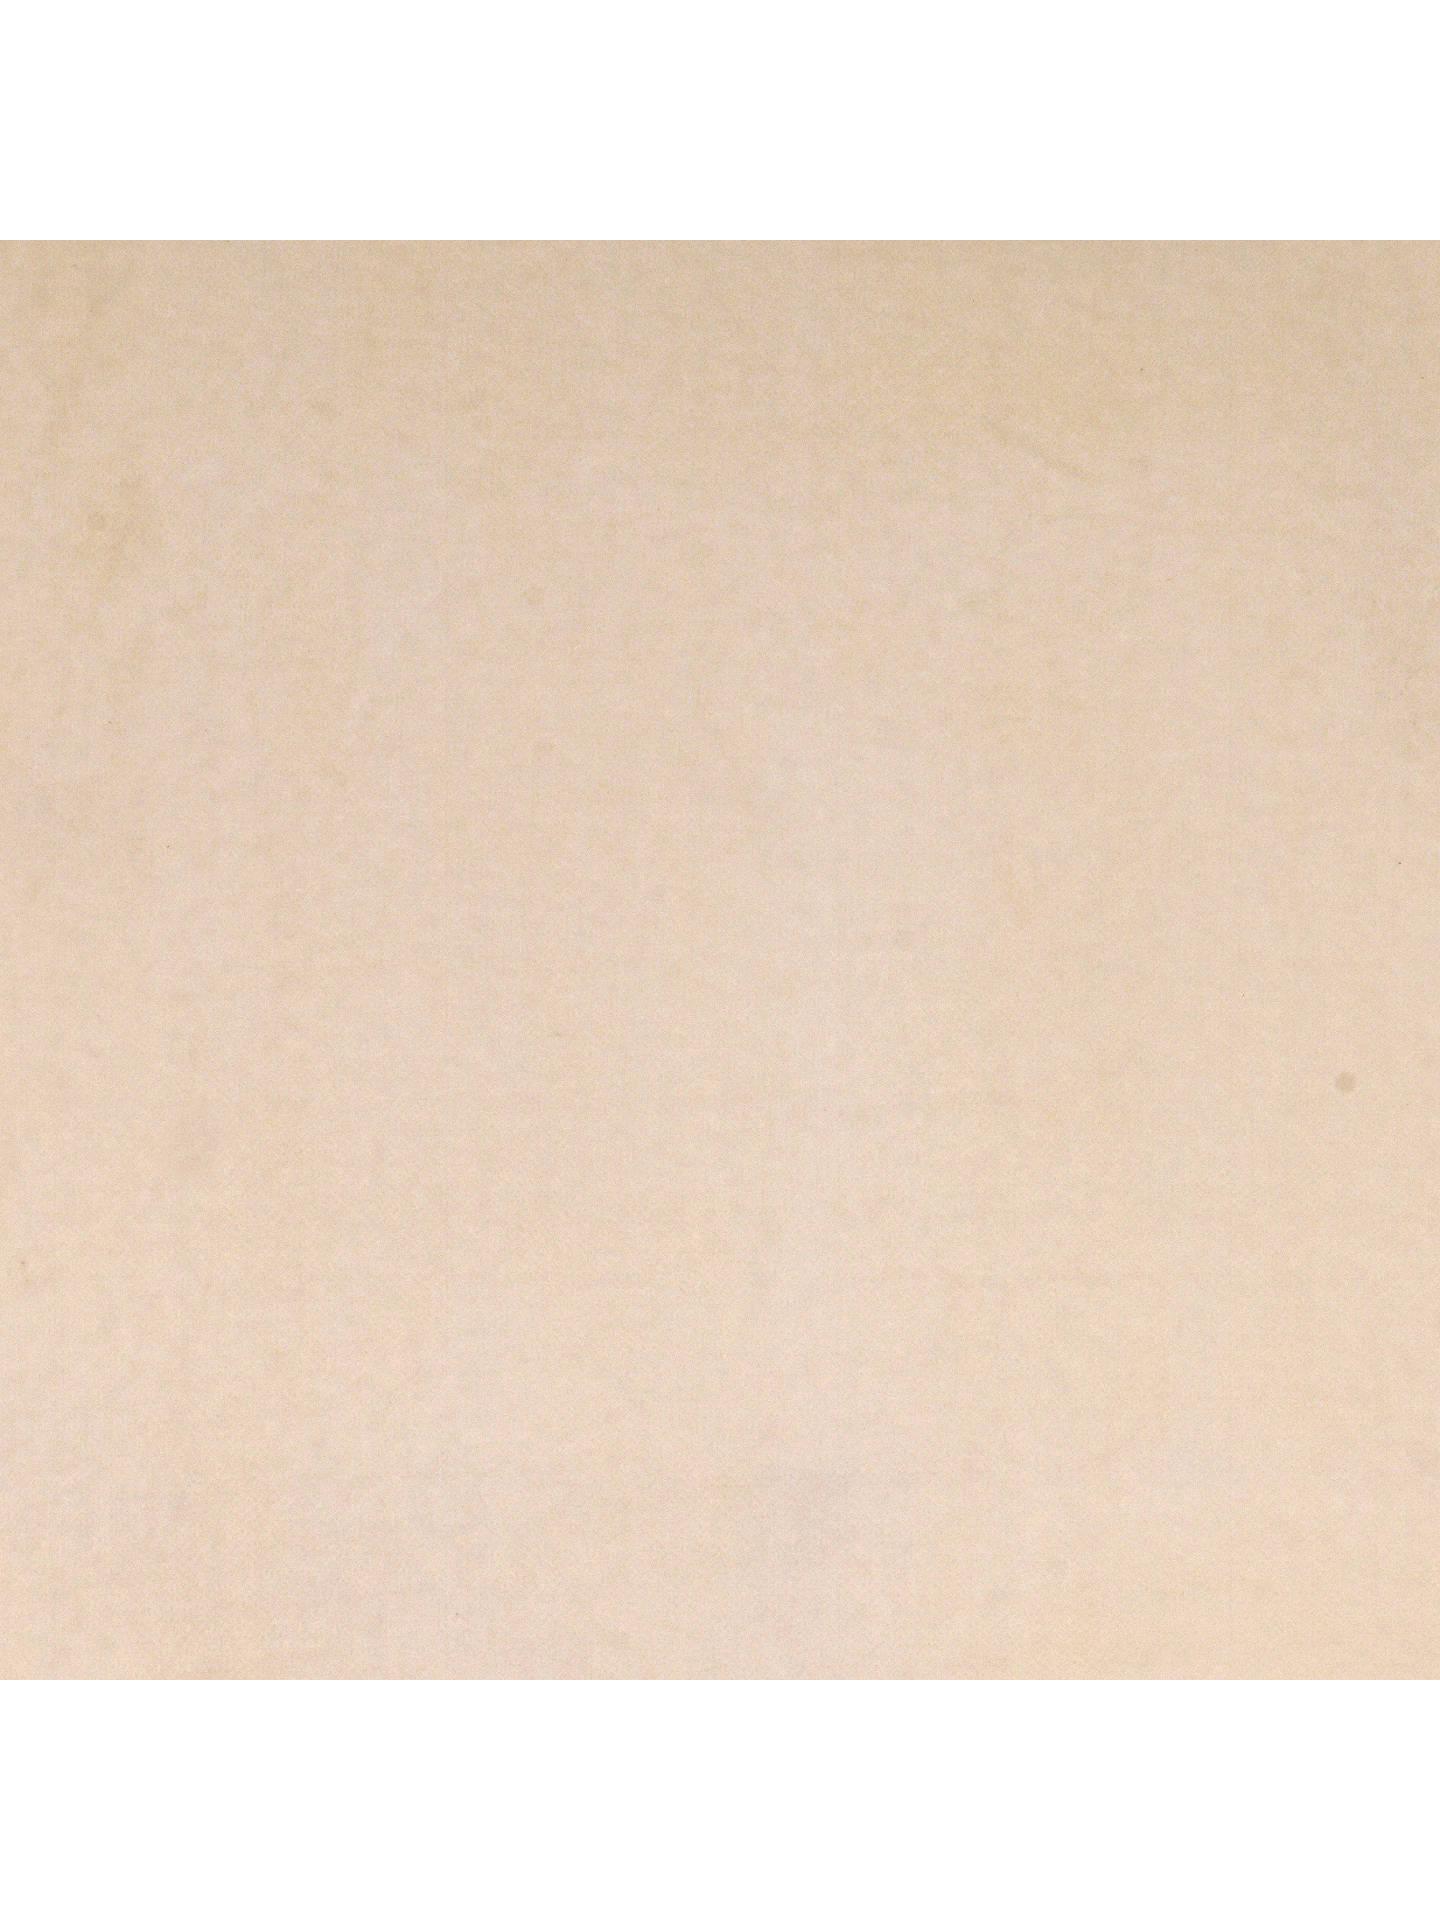 Evatex Curtain Interlining Fabric White At John Lewis